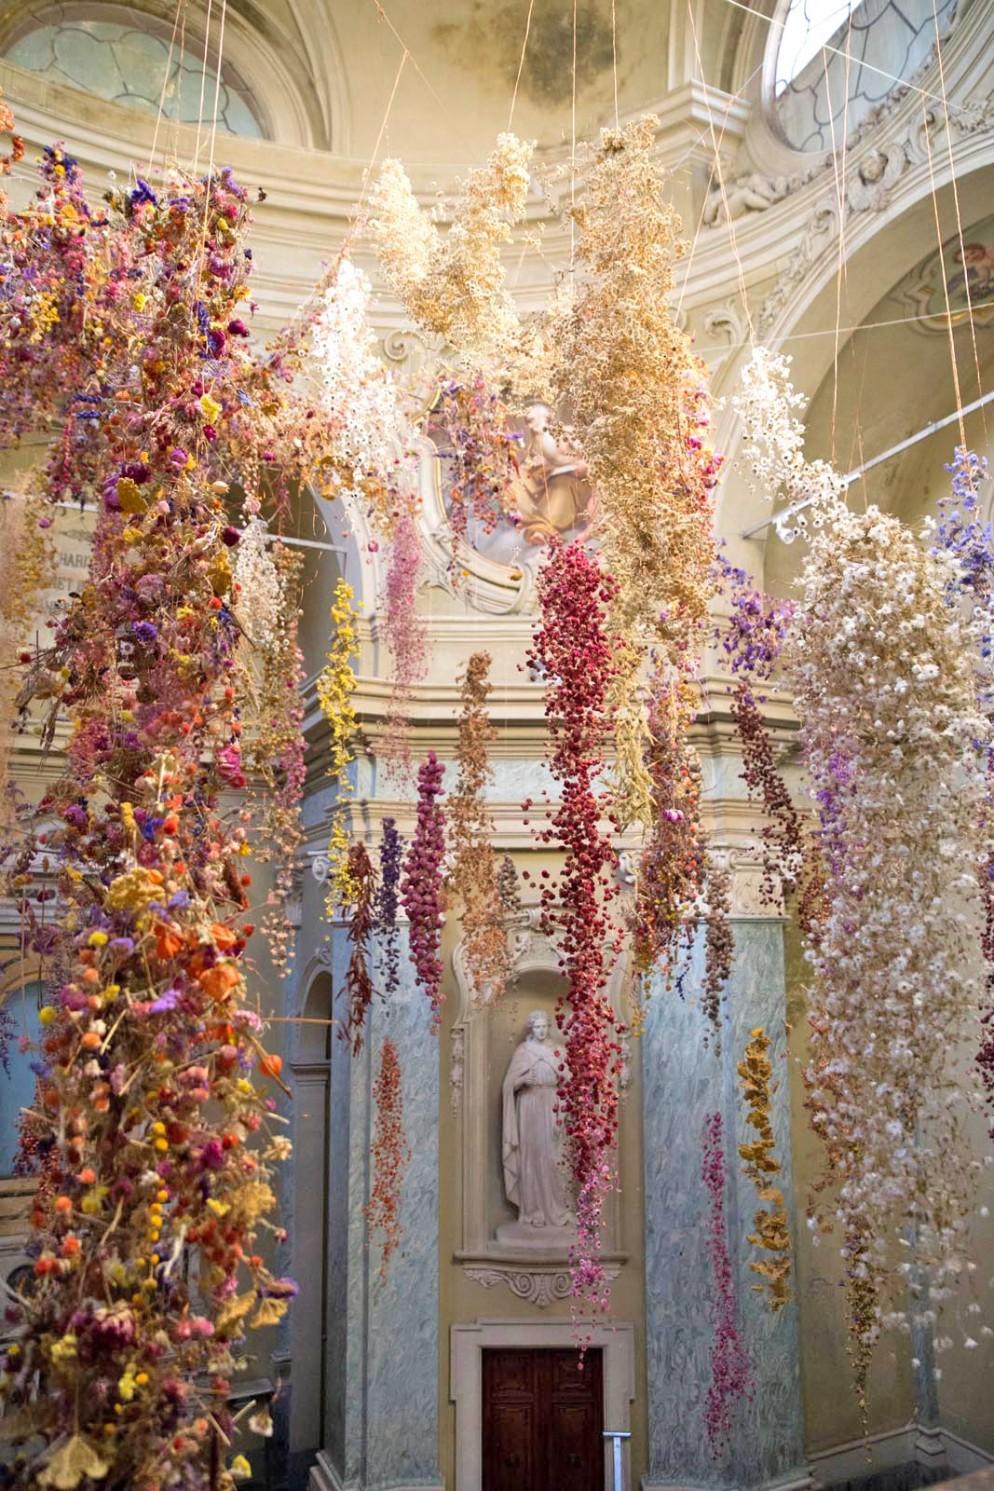 l'installazione Florilegium a Parma | Foto 1 | LivingCorriere